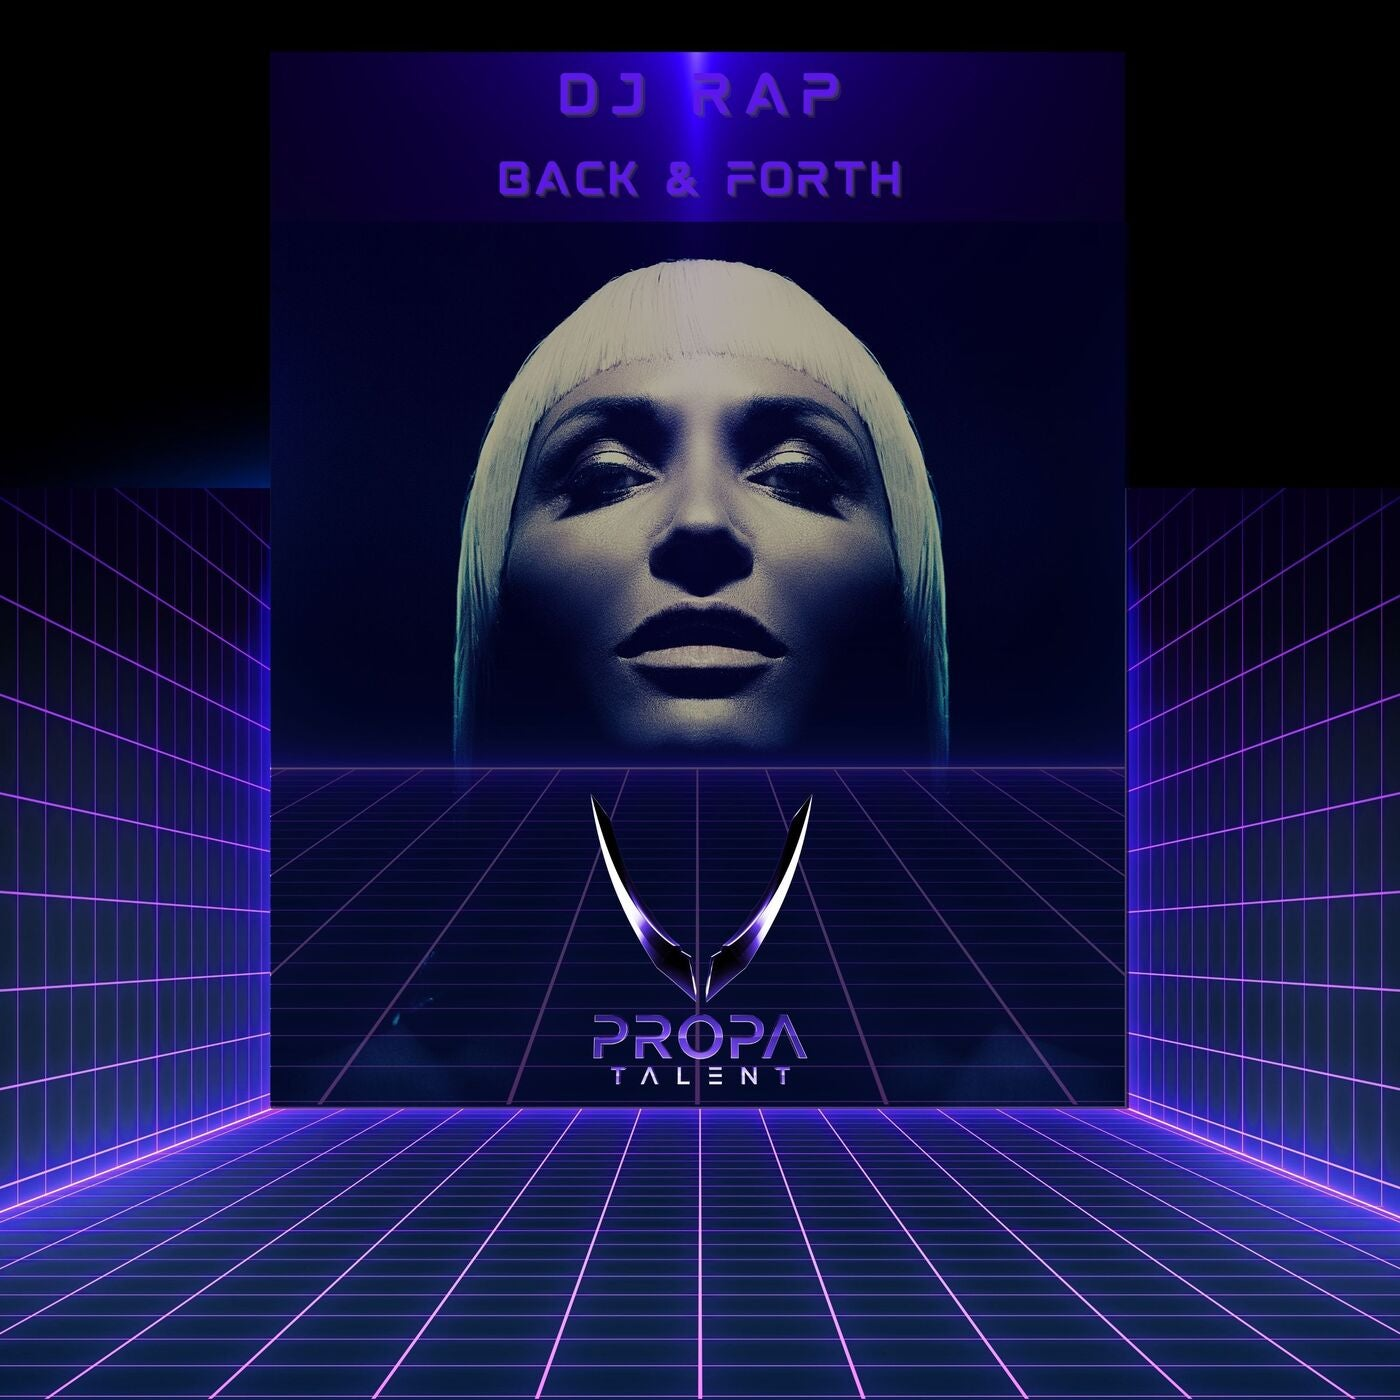 Back & Forth (Original Mix)